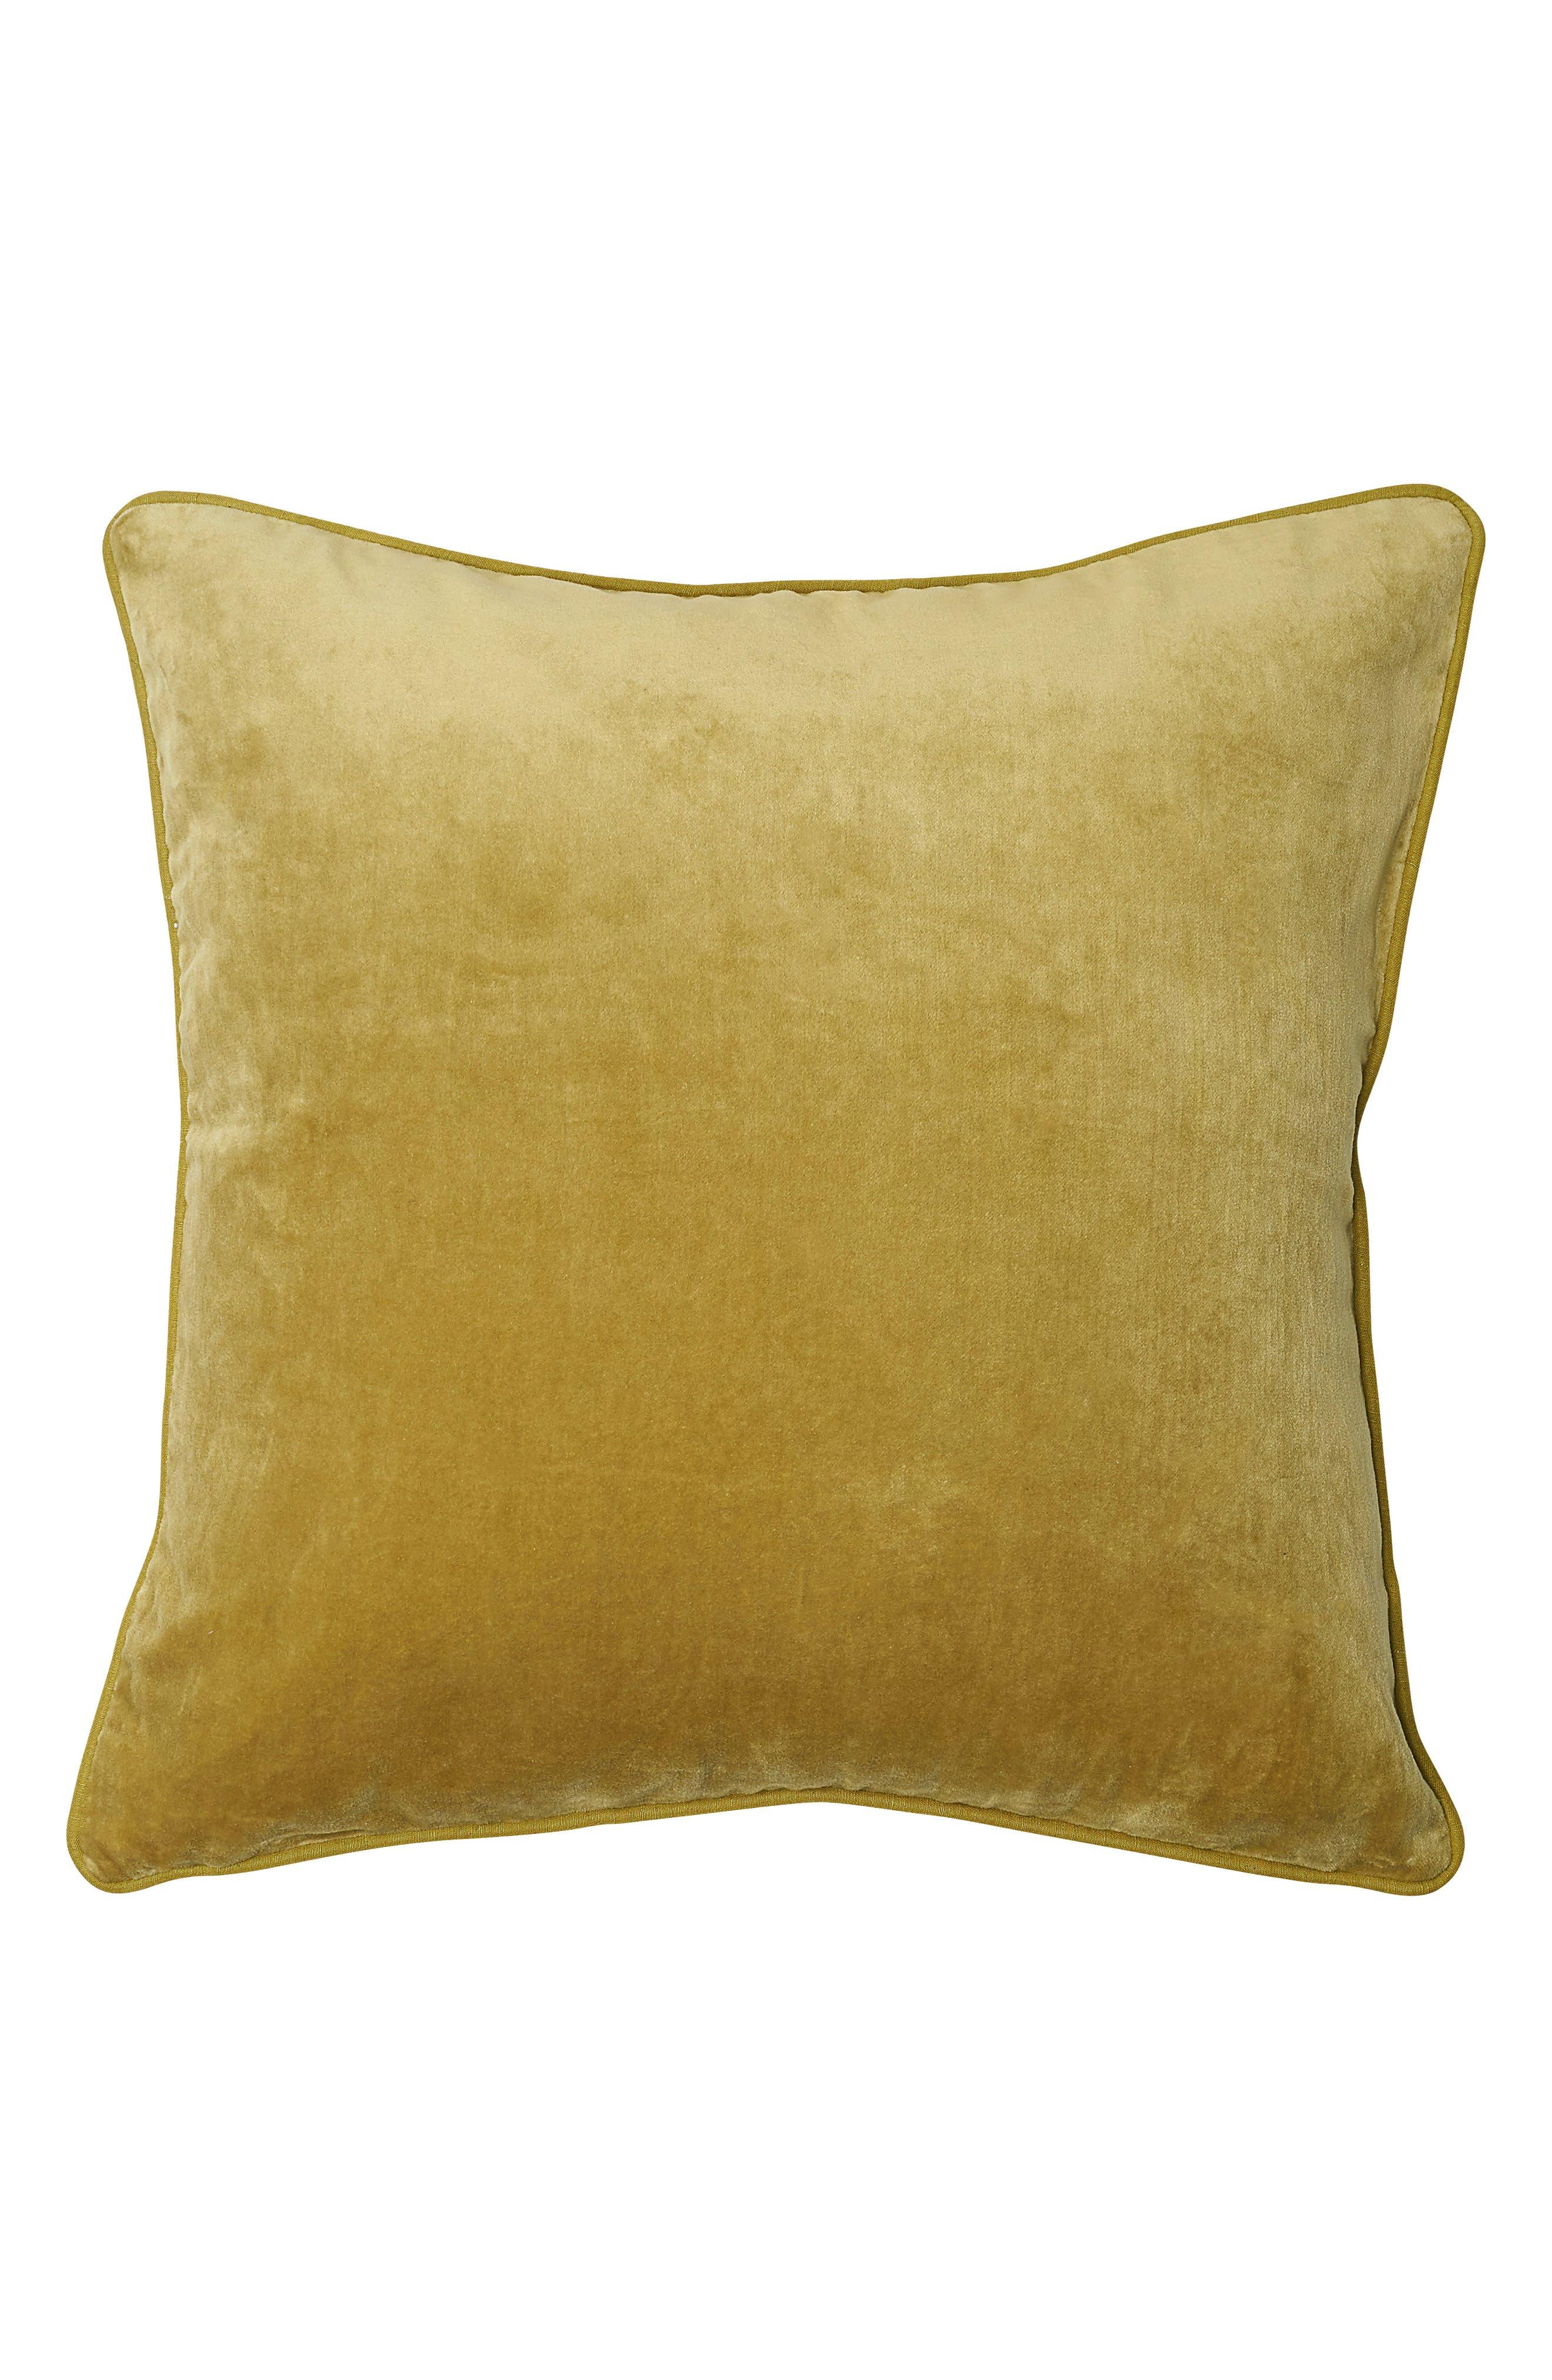 EADIE LIFESTYLE Lynette Velvet Scatter Accent Pillow, Main, color, LIME